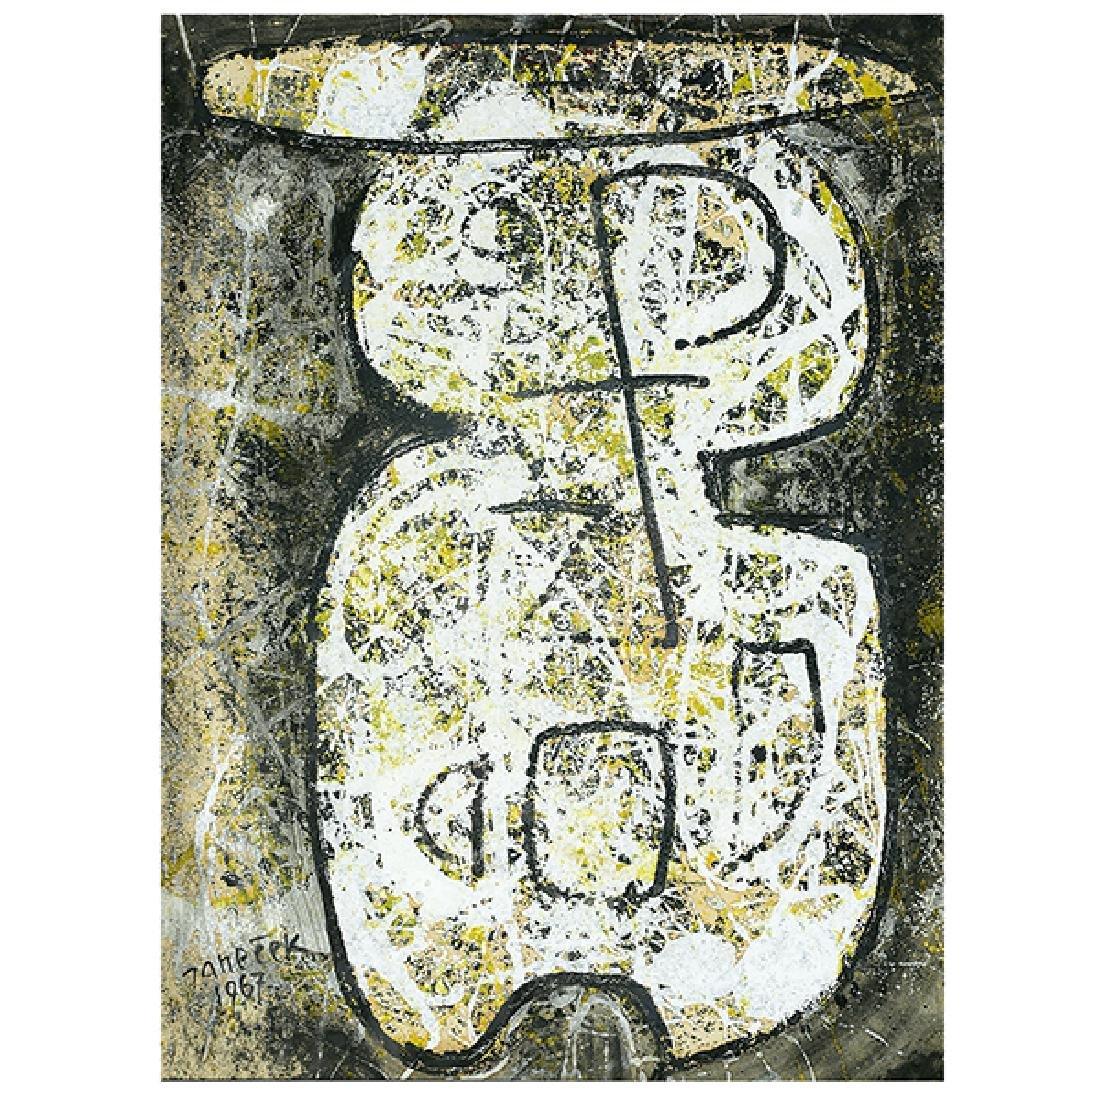 "Ota Janecek ""Abstract Figure"" mixed media on paper"